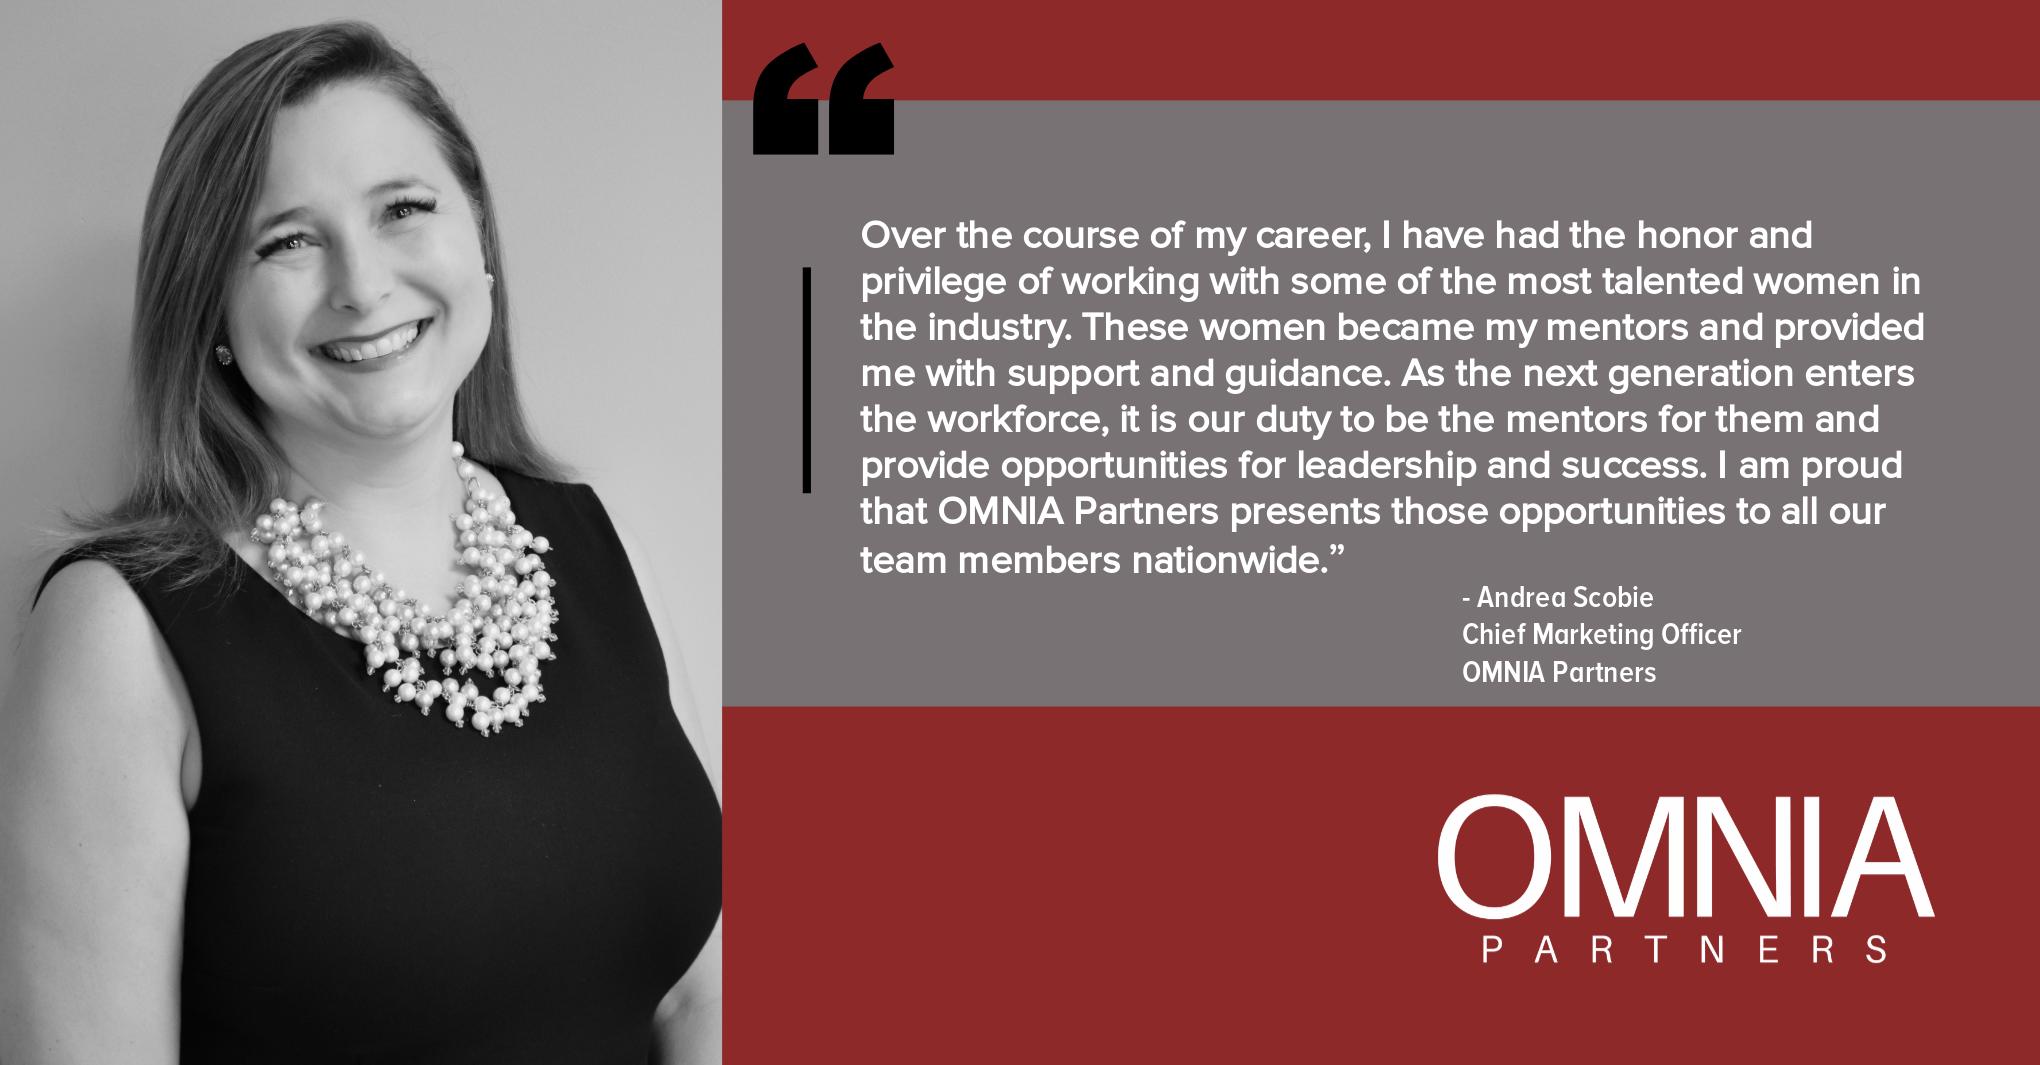 OMNIA Partners Celebrates Women's Month